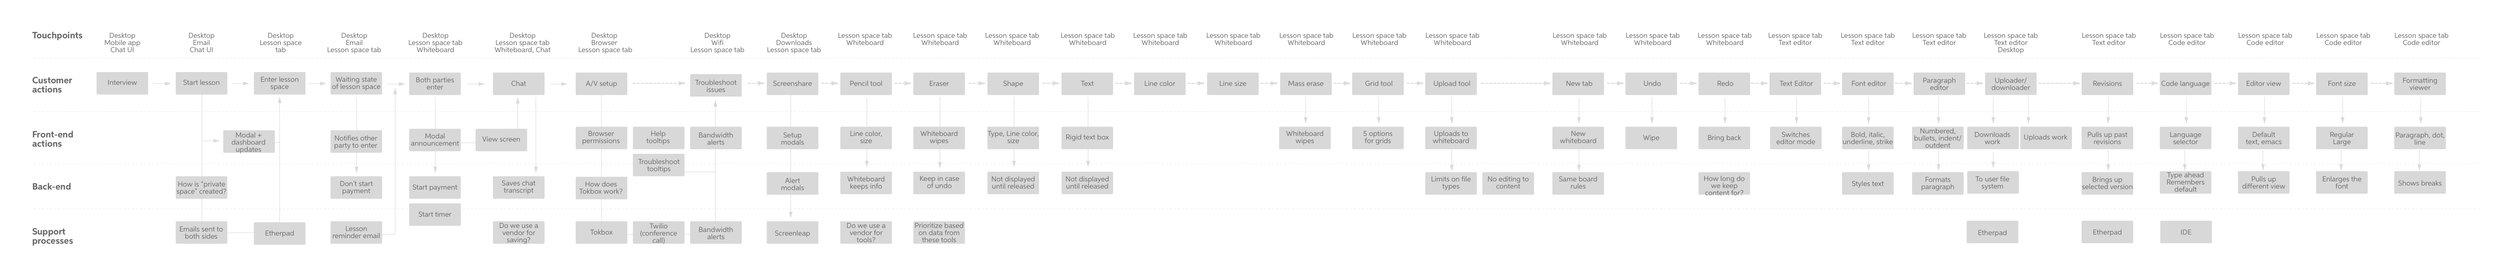 service-blueprint@2x.jpg